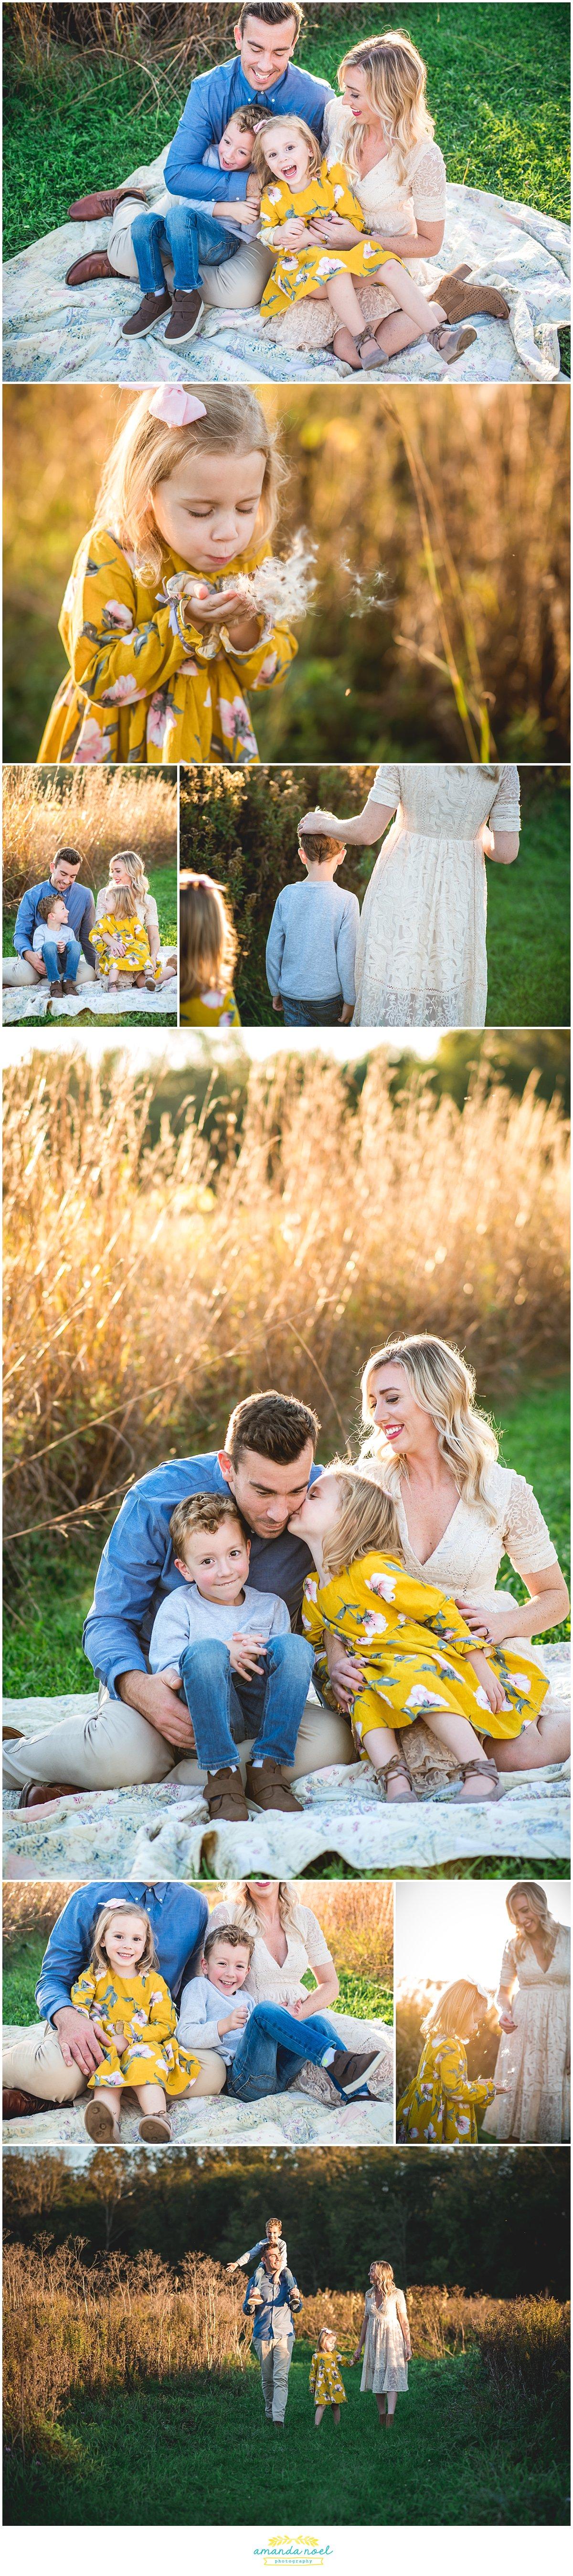 Columbus OH family photographer | Amanda Noel Photography